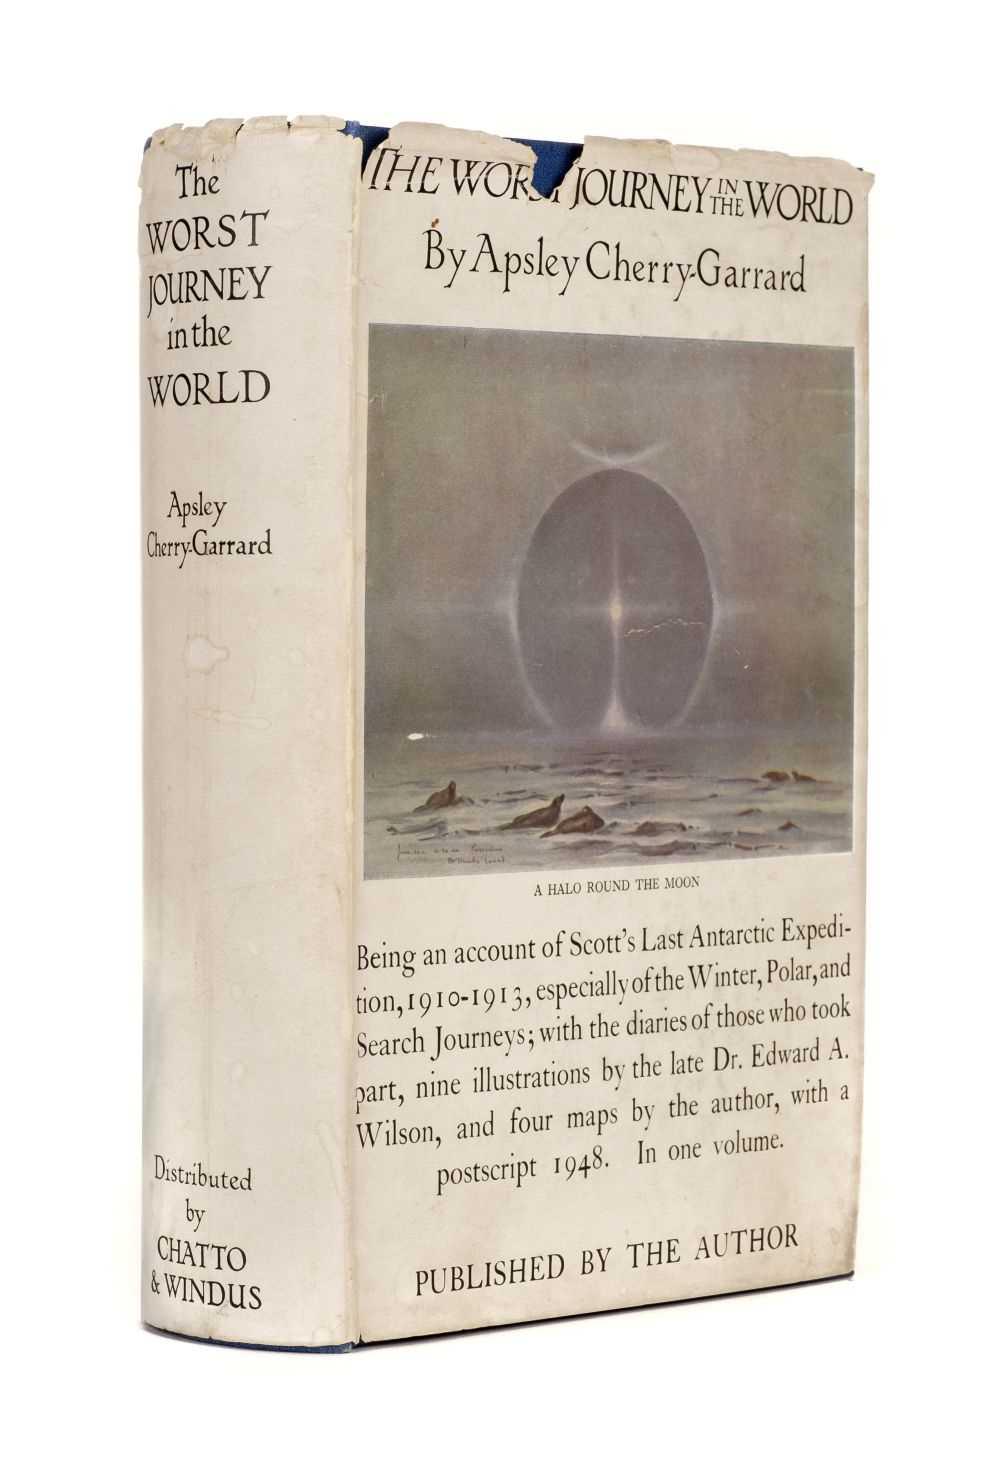 Lot 4 - Cherry-Garrard (Apsley, 1886-1959). The Worst Journey in the World: Antarctic 1910-1913, inscribed